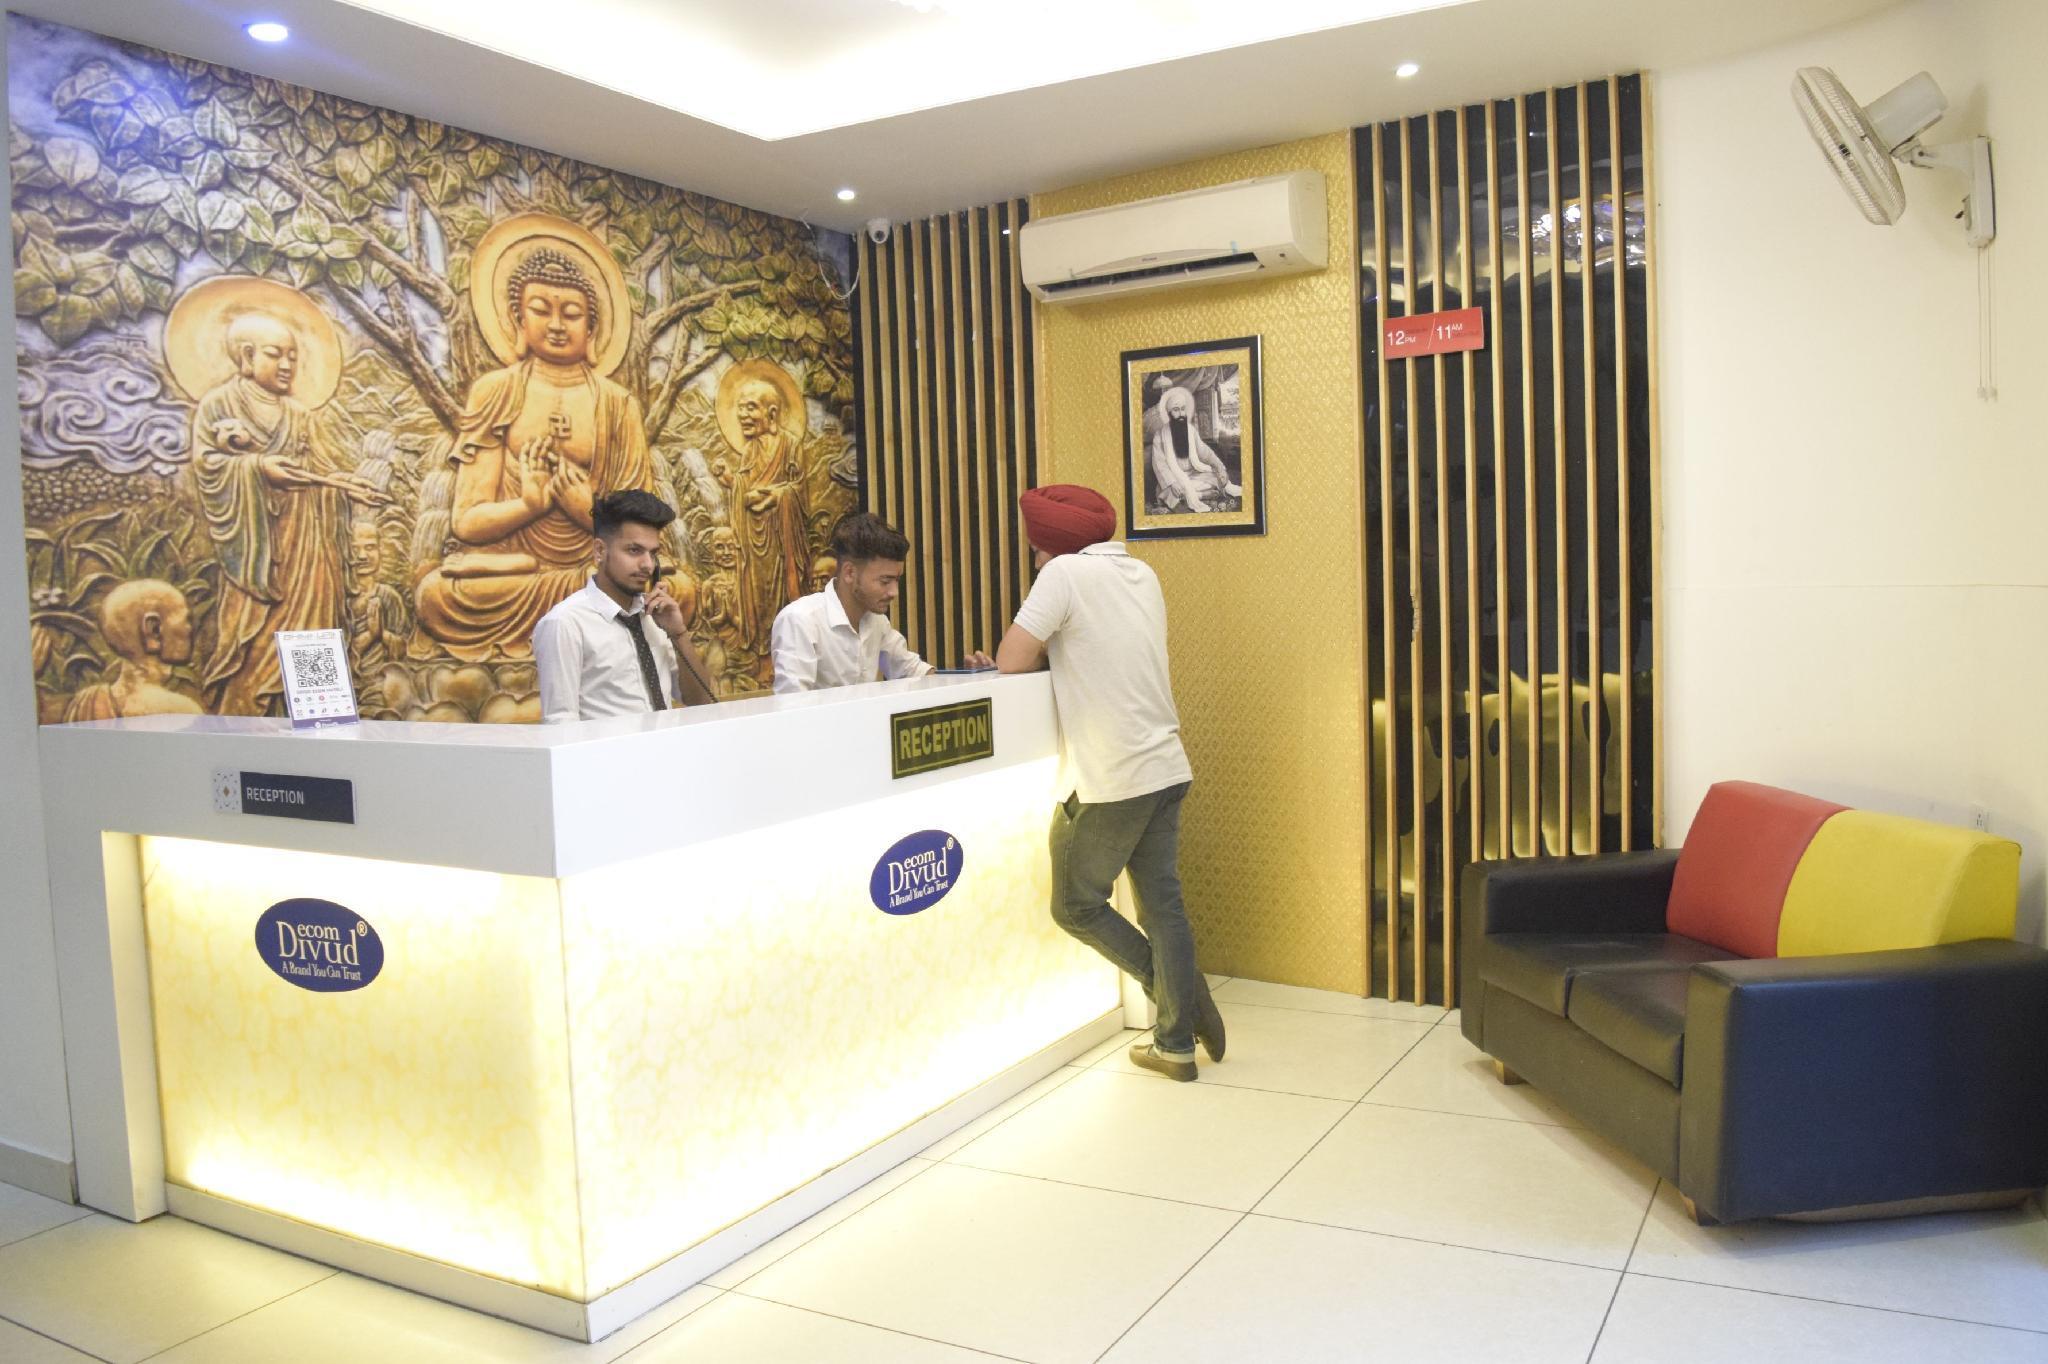 Divud Ecom Hotel